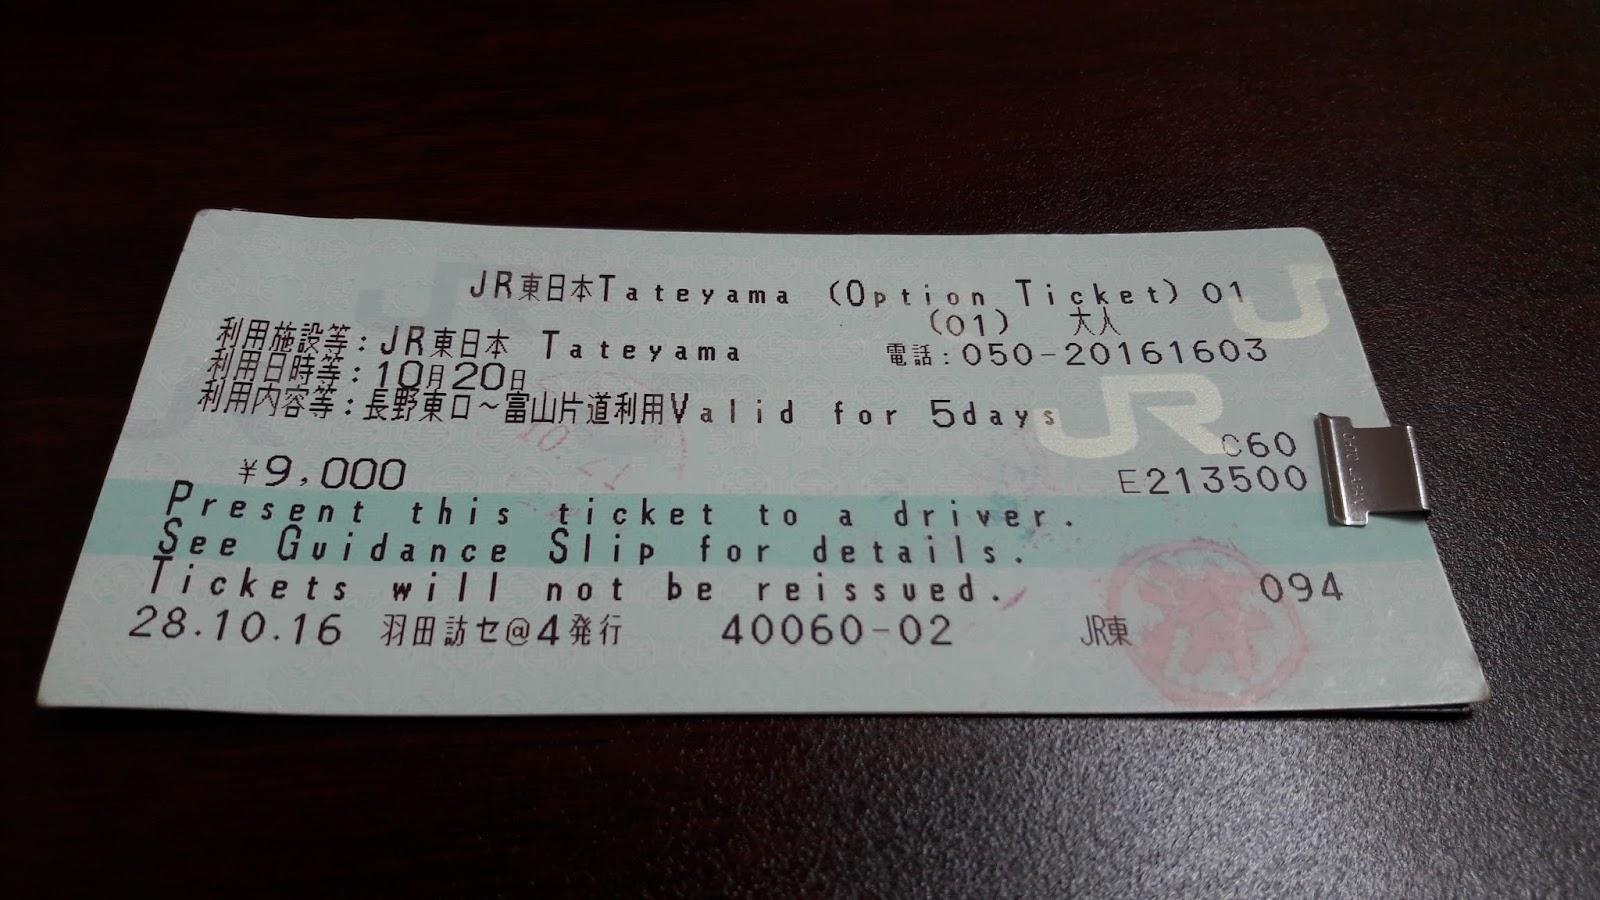 Catatan Perjalanan Transportasi Selama Di Jepang Tanpa Jr Pass Takayama Hokuriku 5 Days Jrpass Dewasa Tateyama Option Ticket